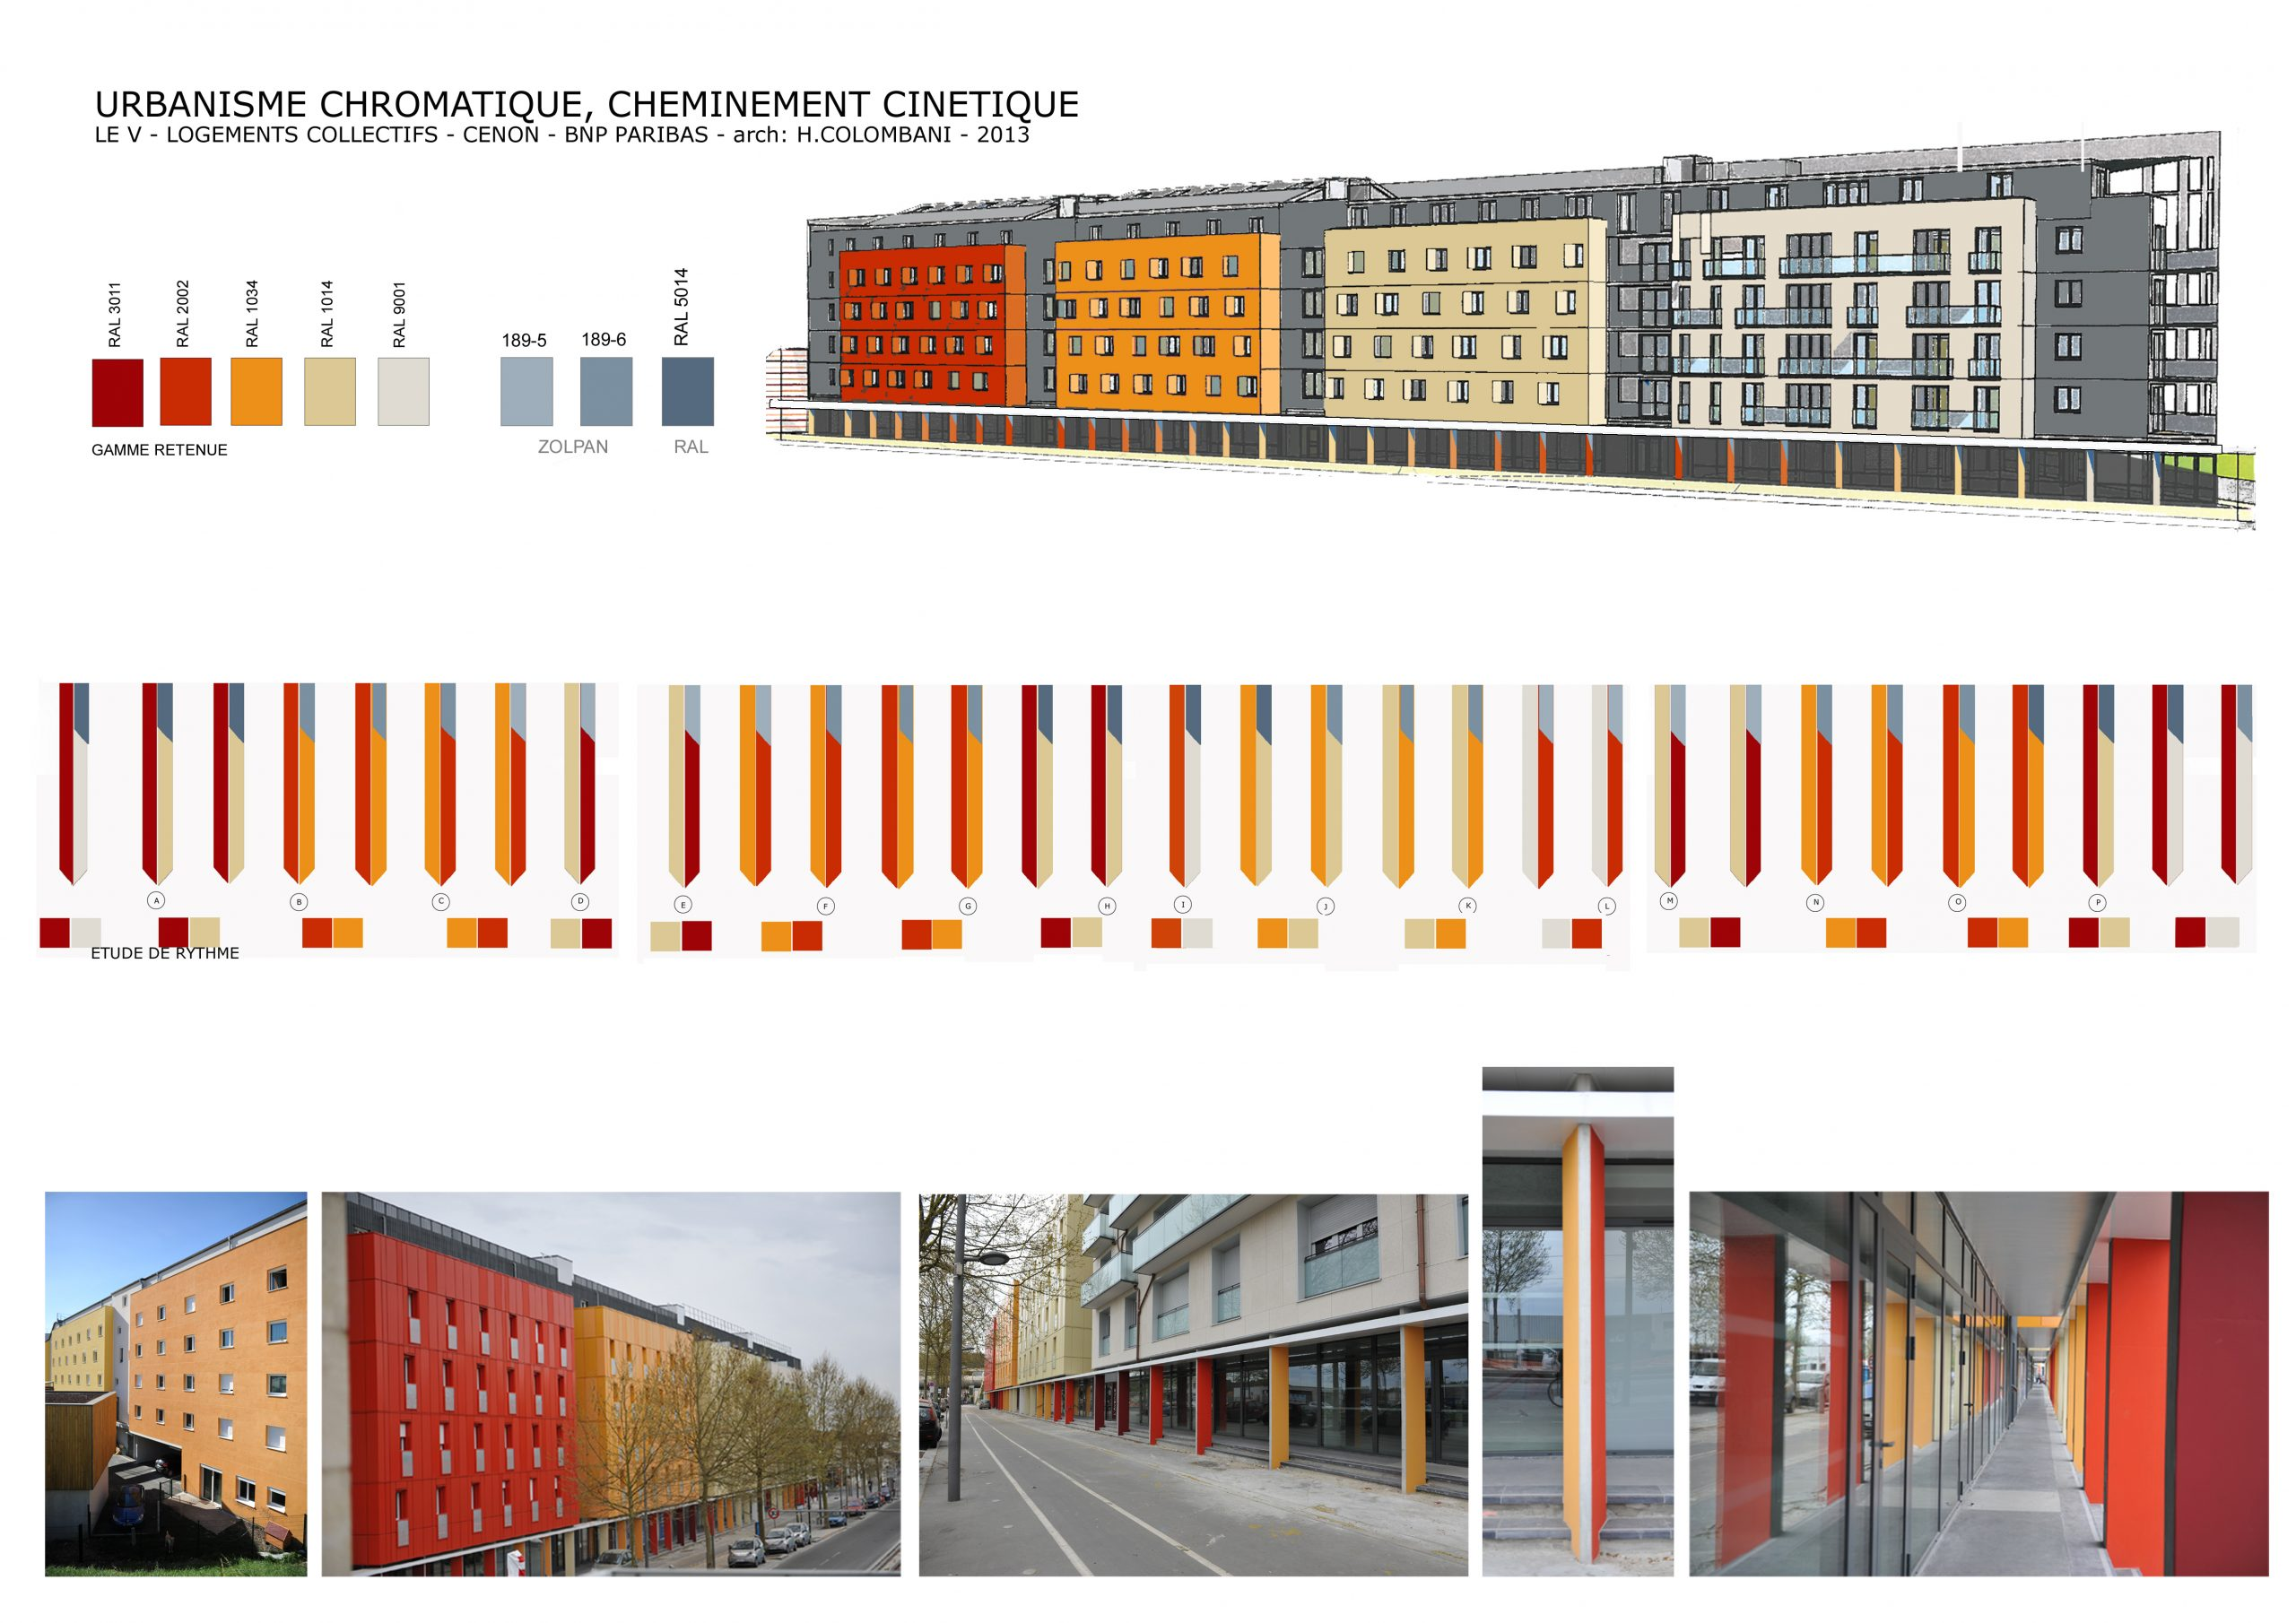 Collectifs-Chromo-architecture-arch Henry Colombani